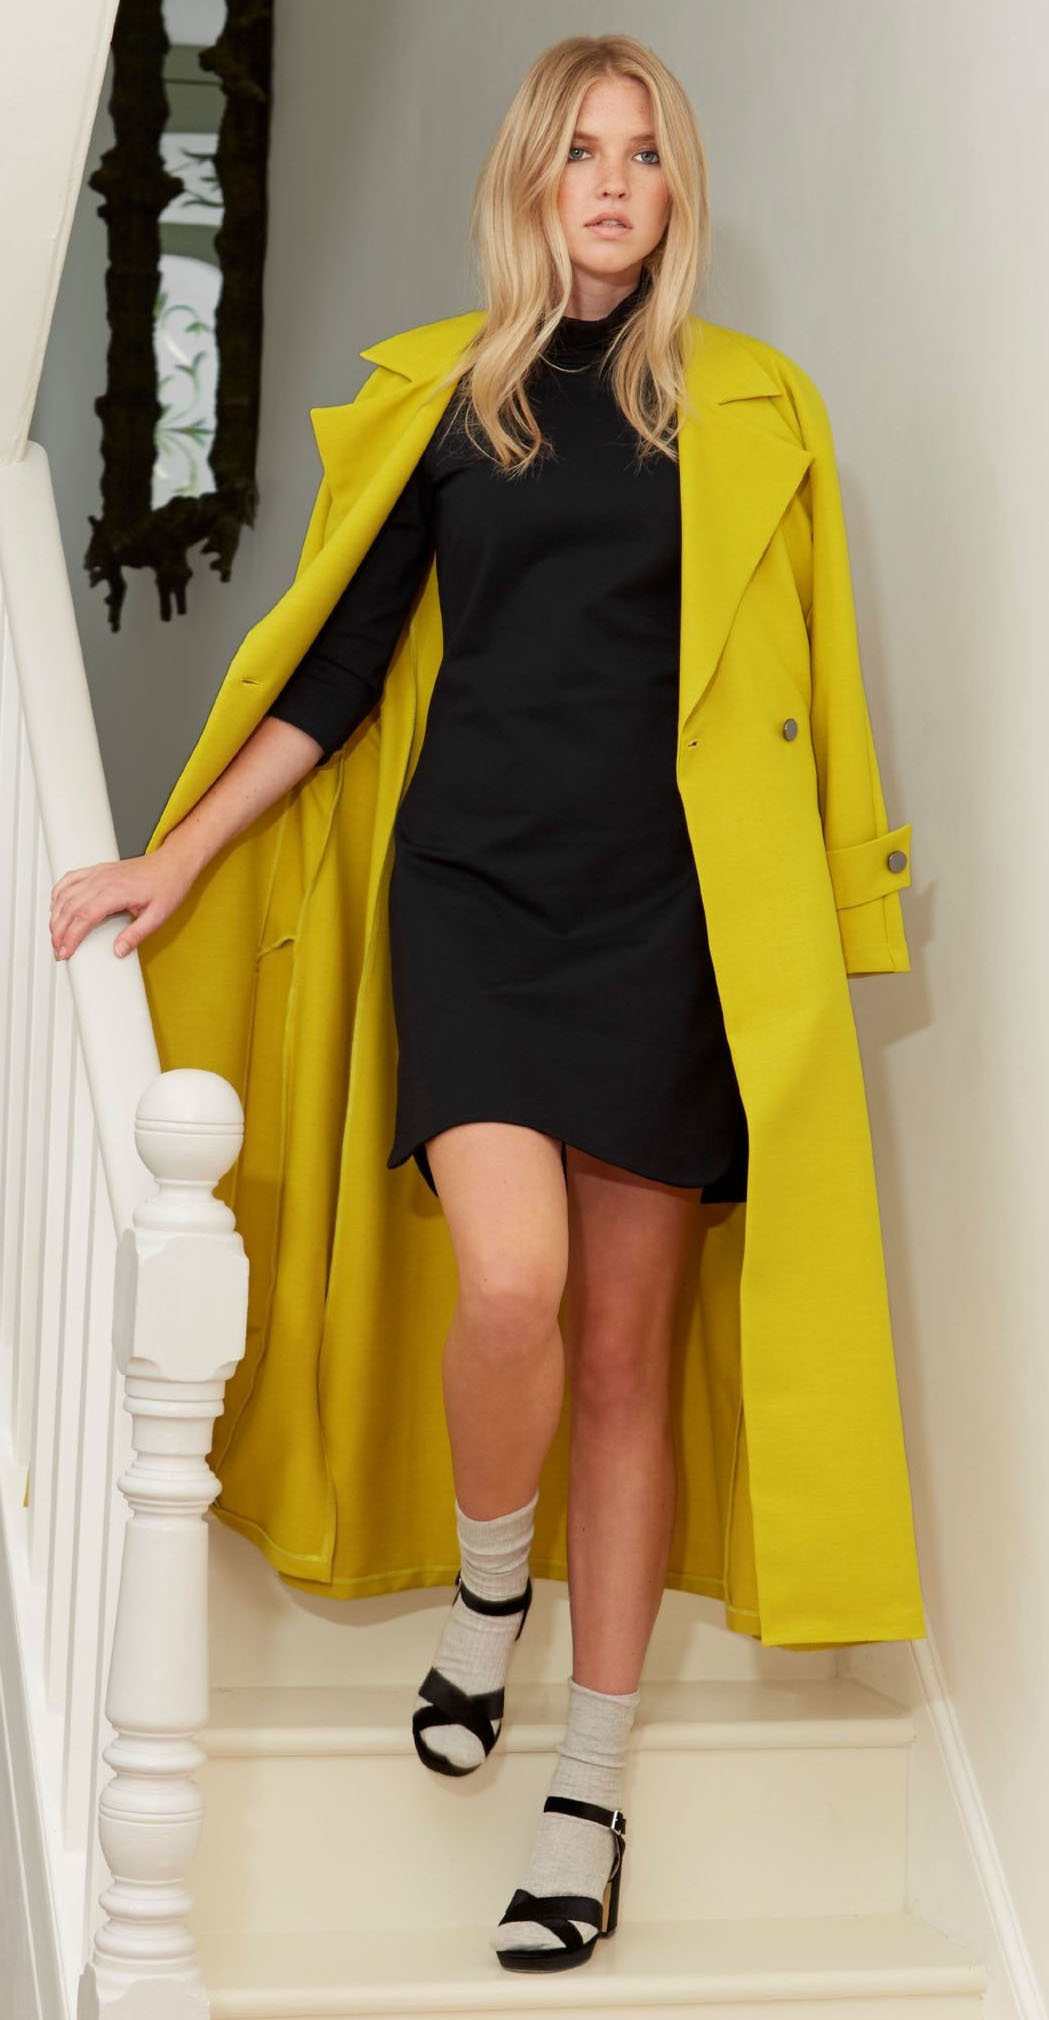 black-dress-sweater-mini-socks-black-shoe-sandalh-blonde-yellow-jacket-coat-trench-fall-winter-lunch.jpg